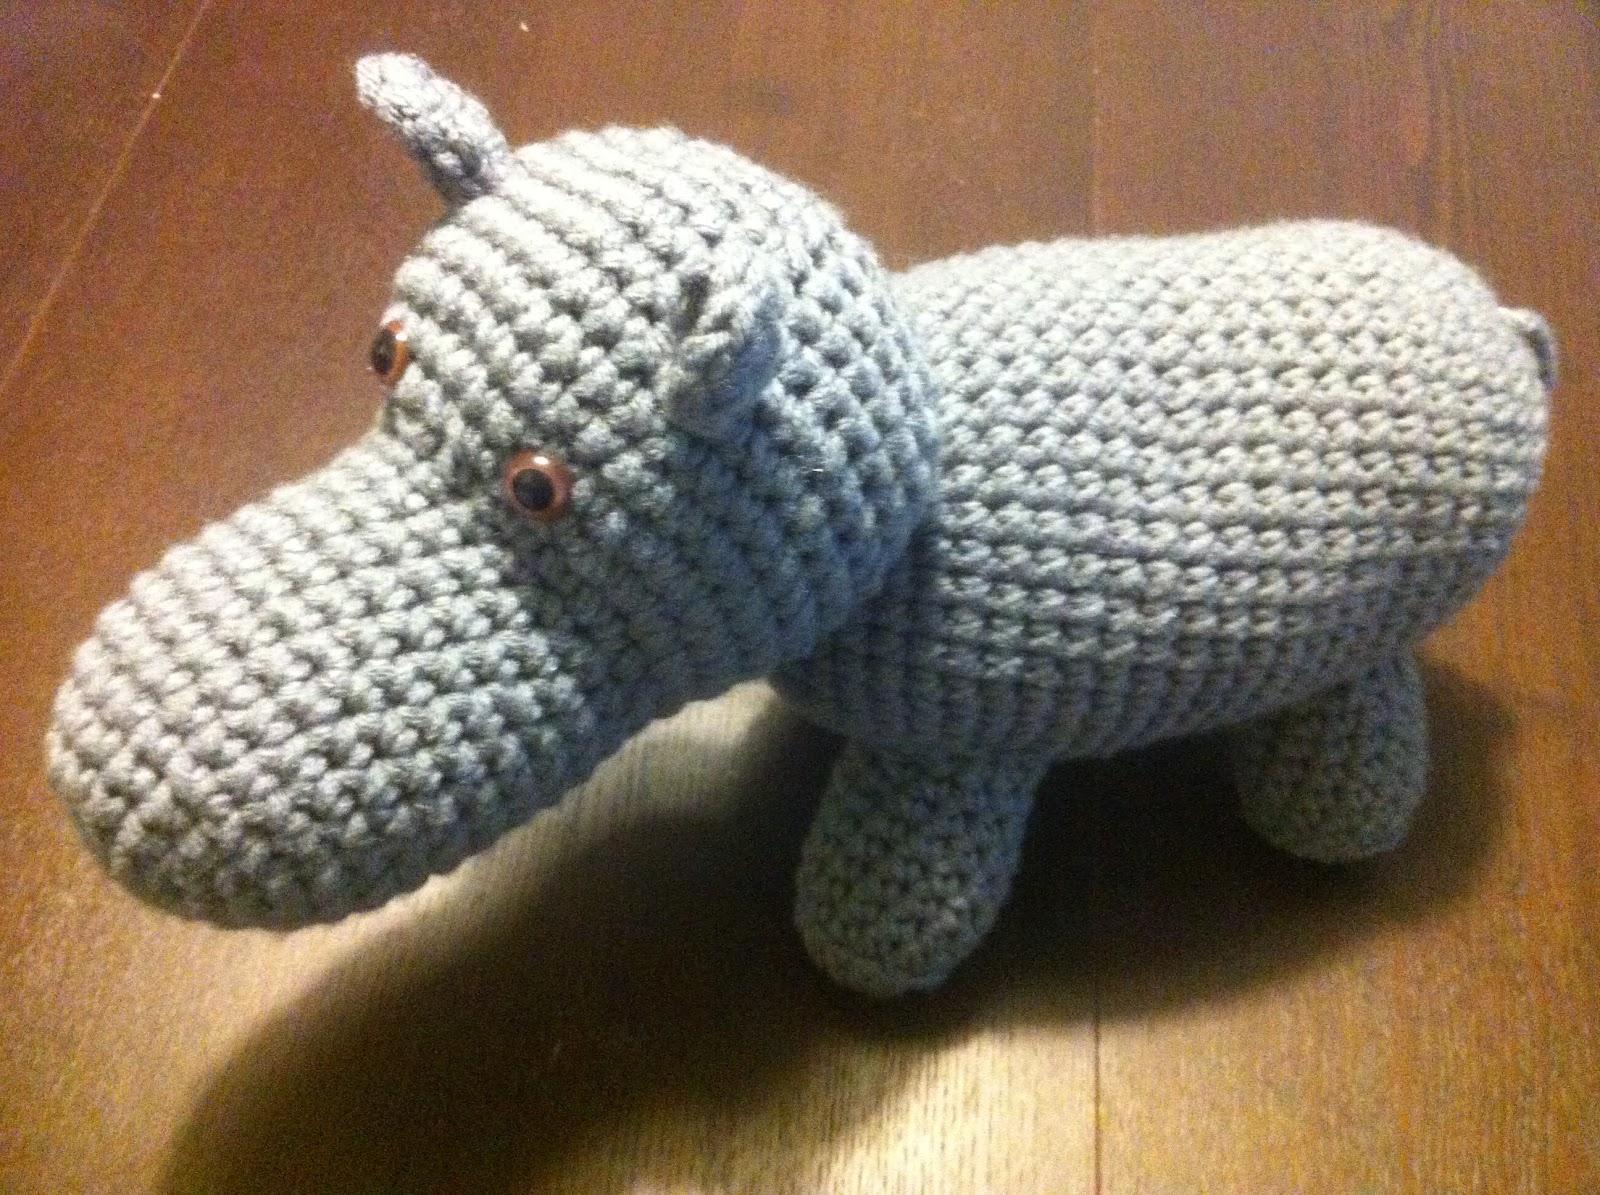 Crochet Pattern Free Hippo : Tansy Dolls: Crochet Hippo Pattern